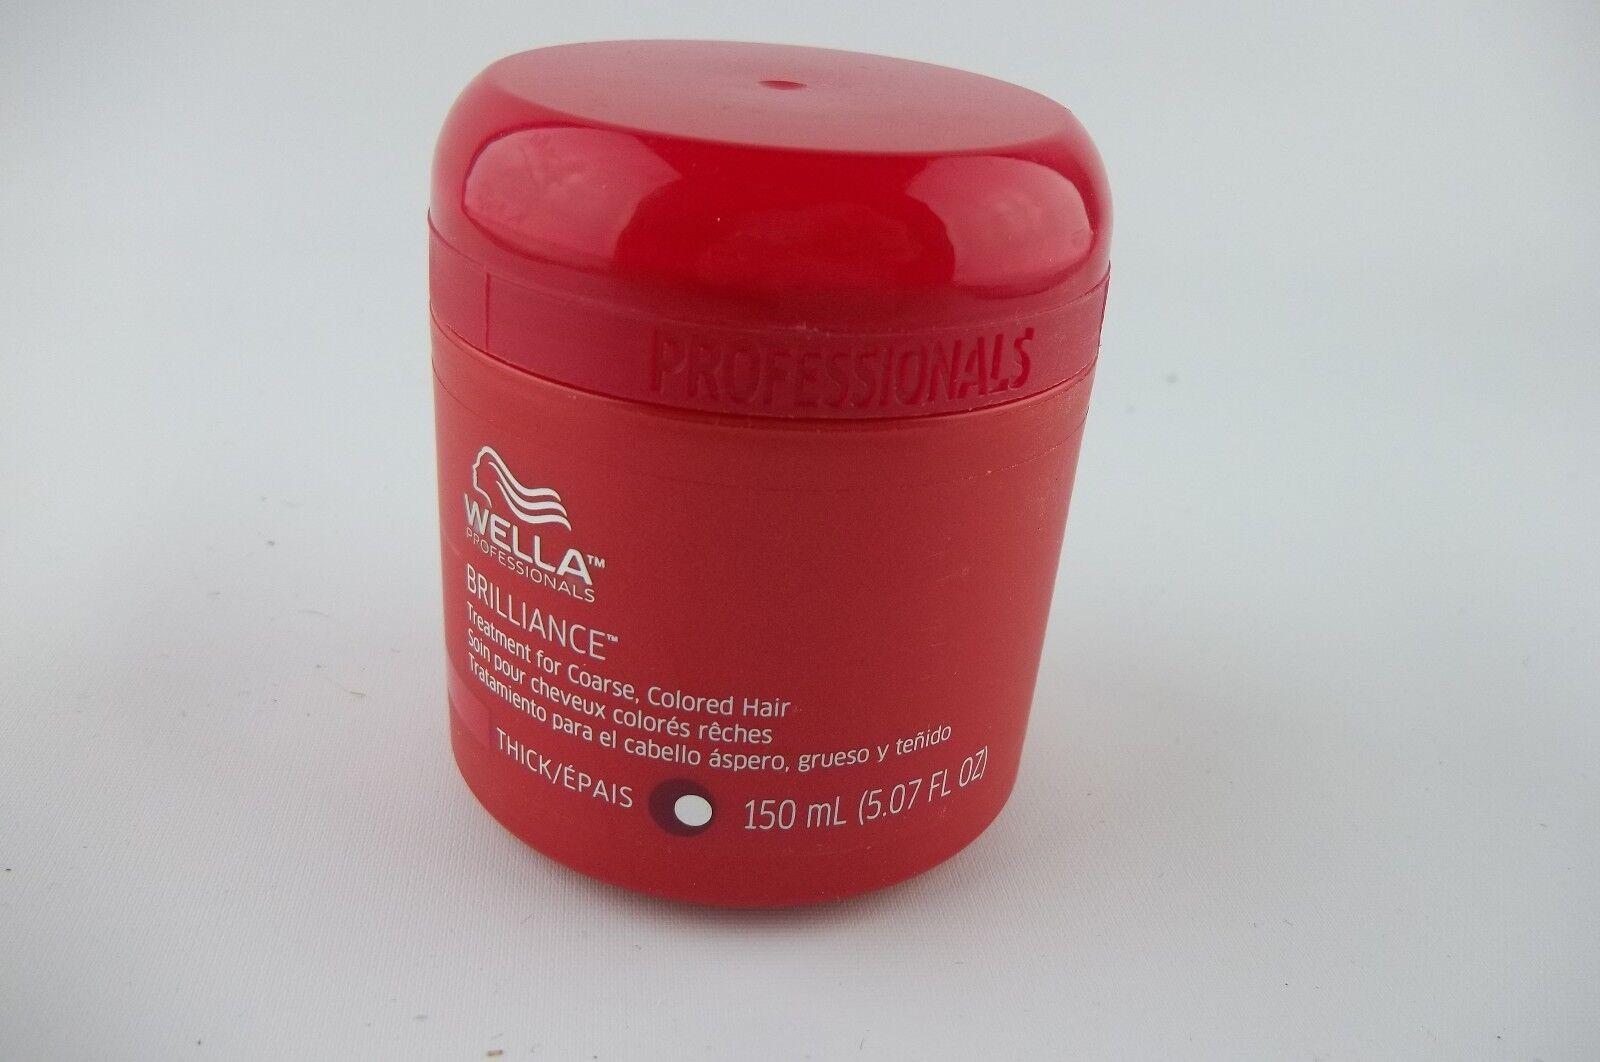 Wella Coarse Colored Hair Brilliance Treatment for Unisex, 5